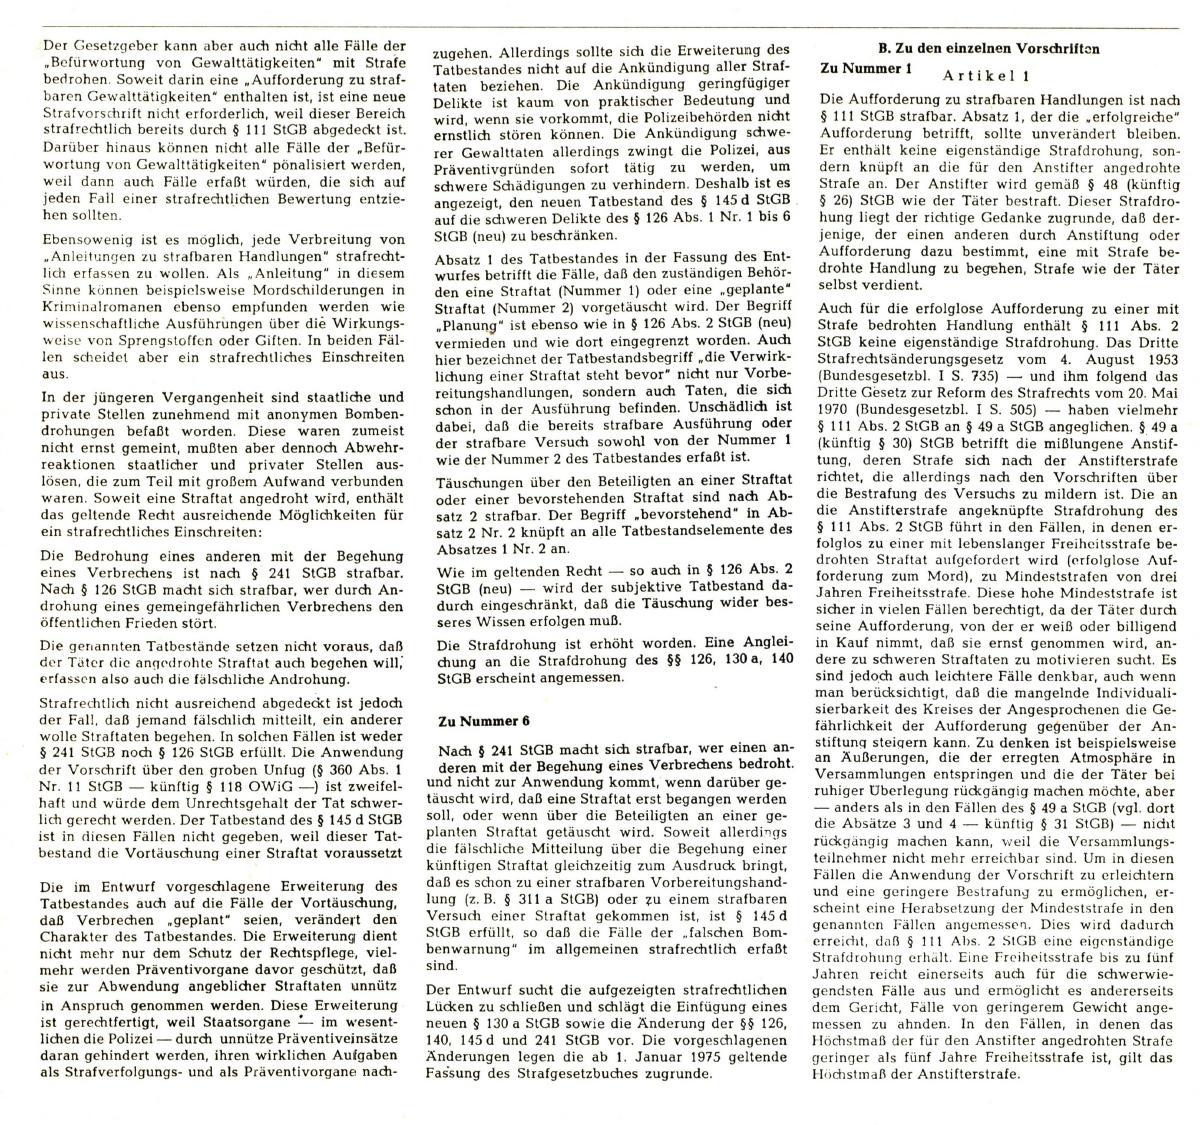 REP_VLB_1976_Die_Zensurgesetze_49